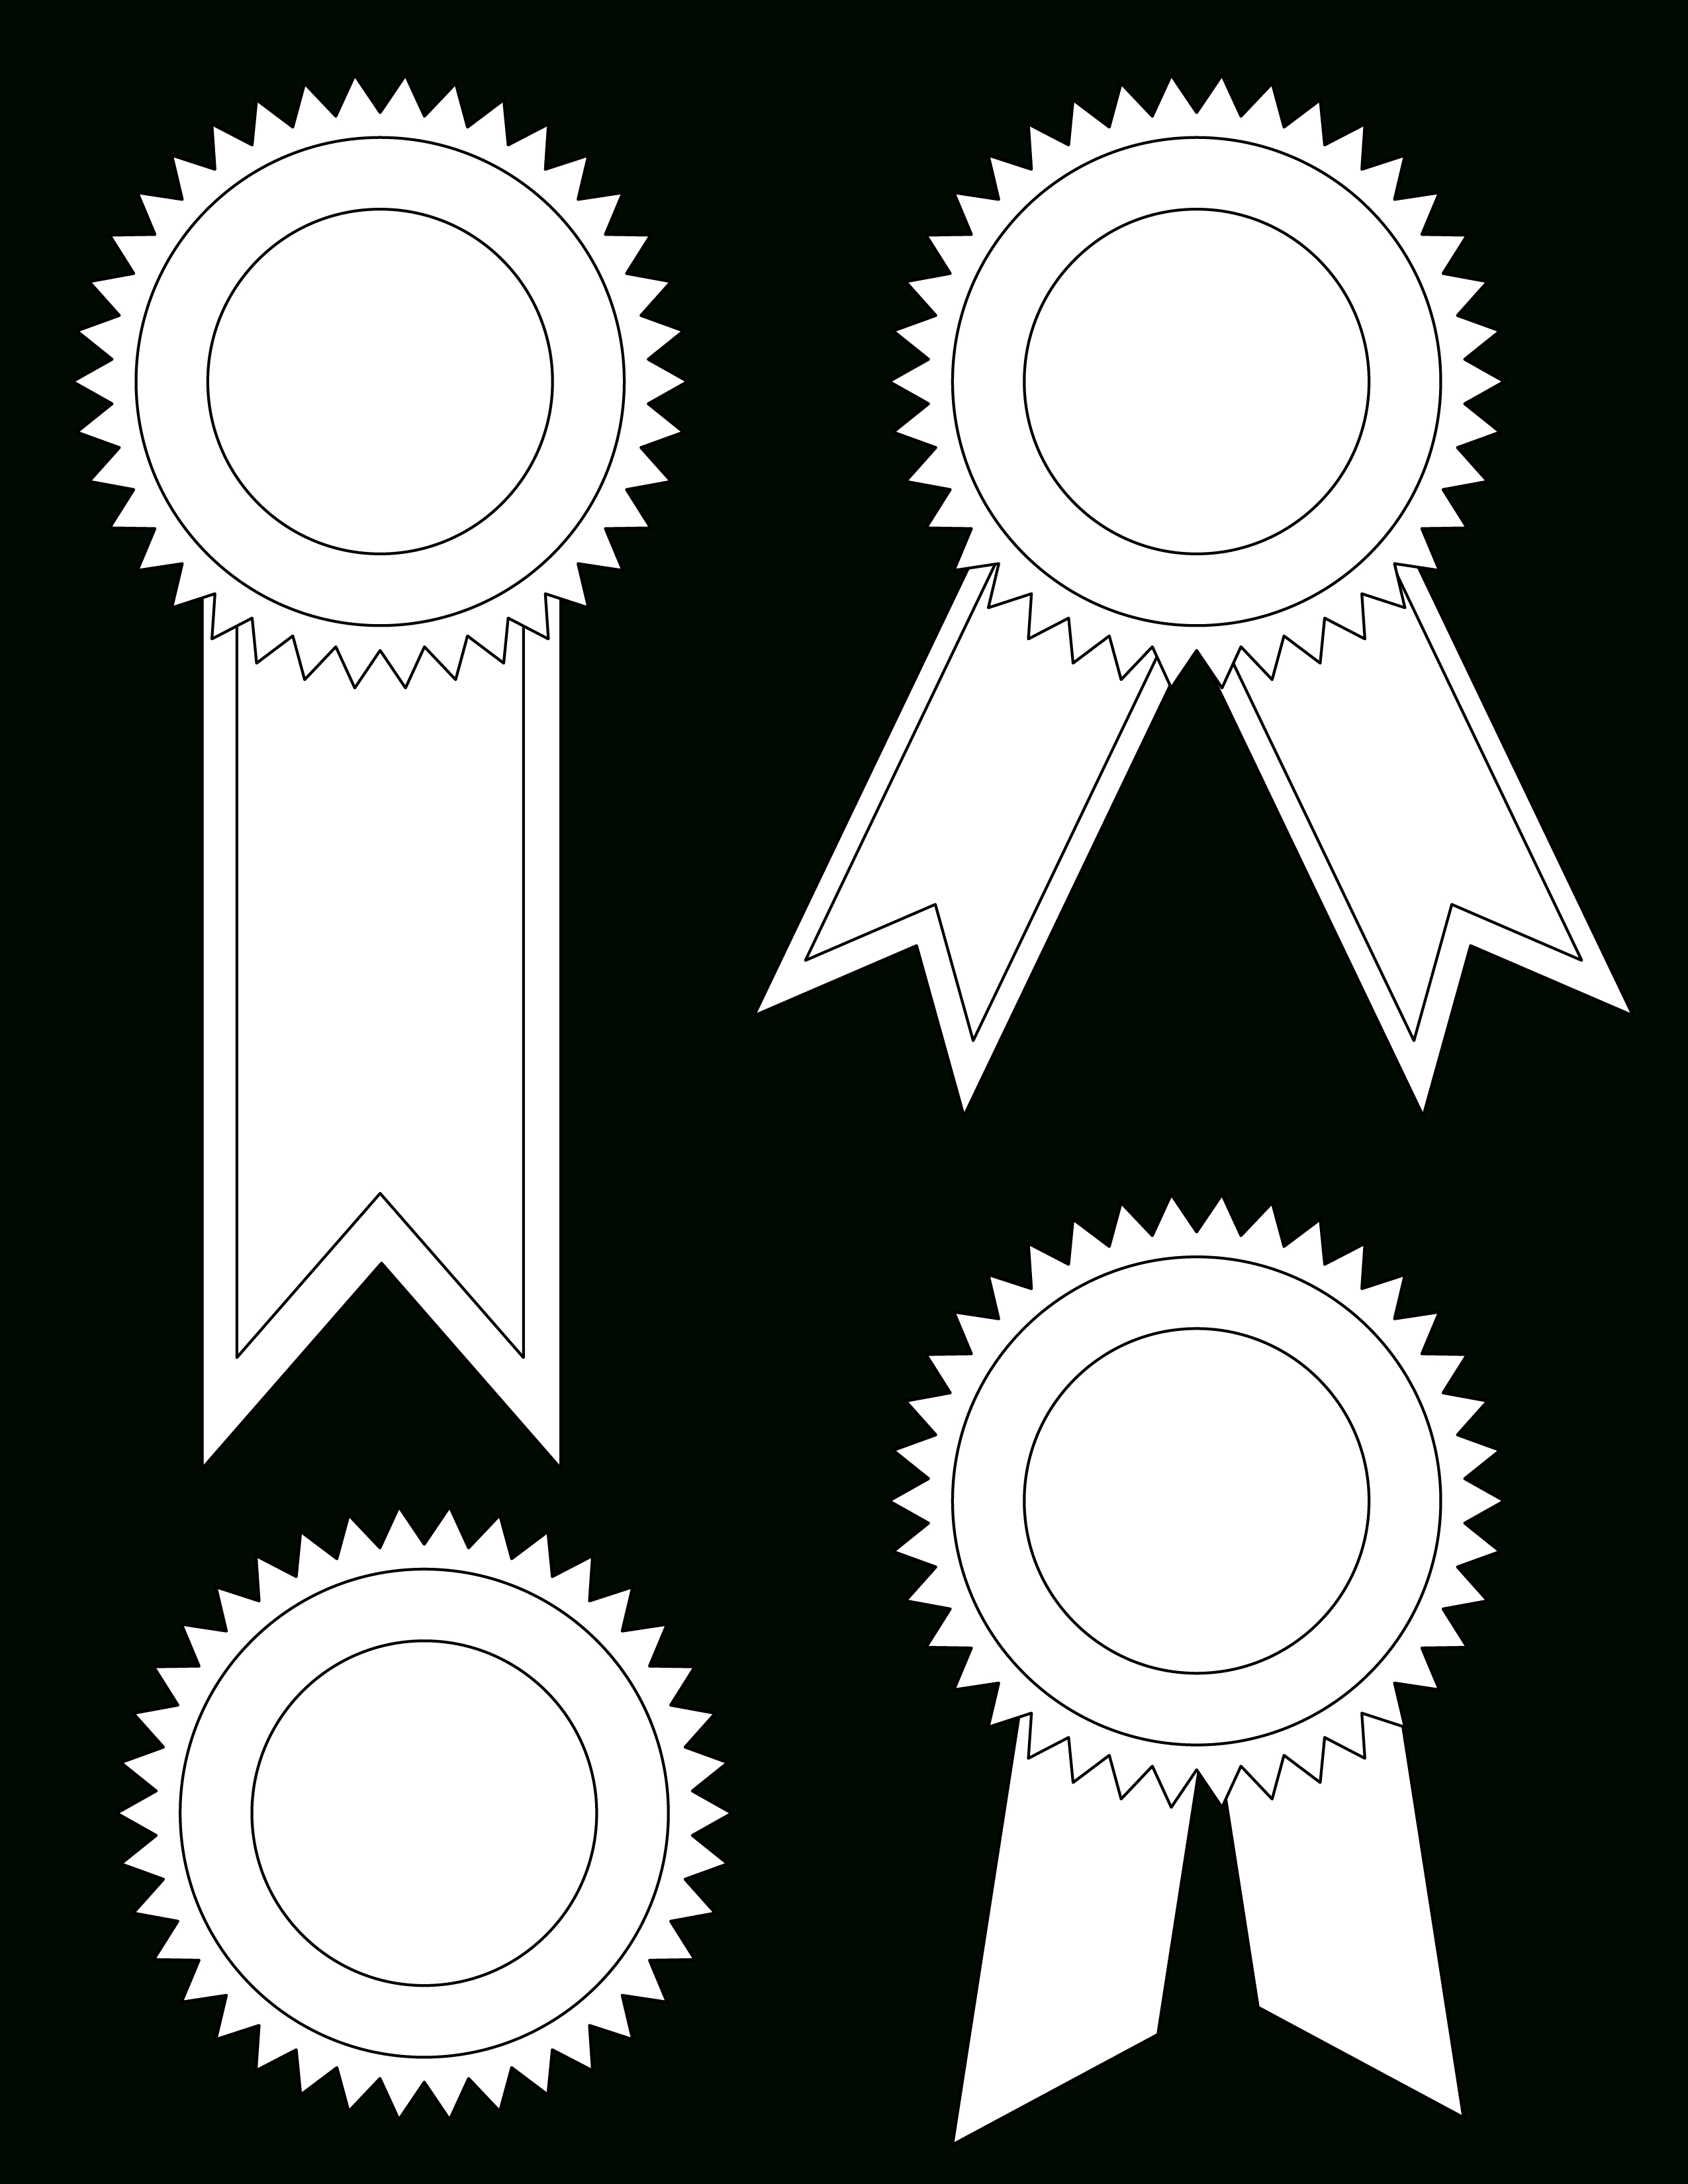 Free Ribbon Template, Download Free Clip Art, Free Clip Art On - Free Printable Ribbons